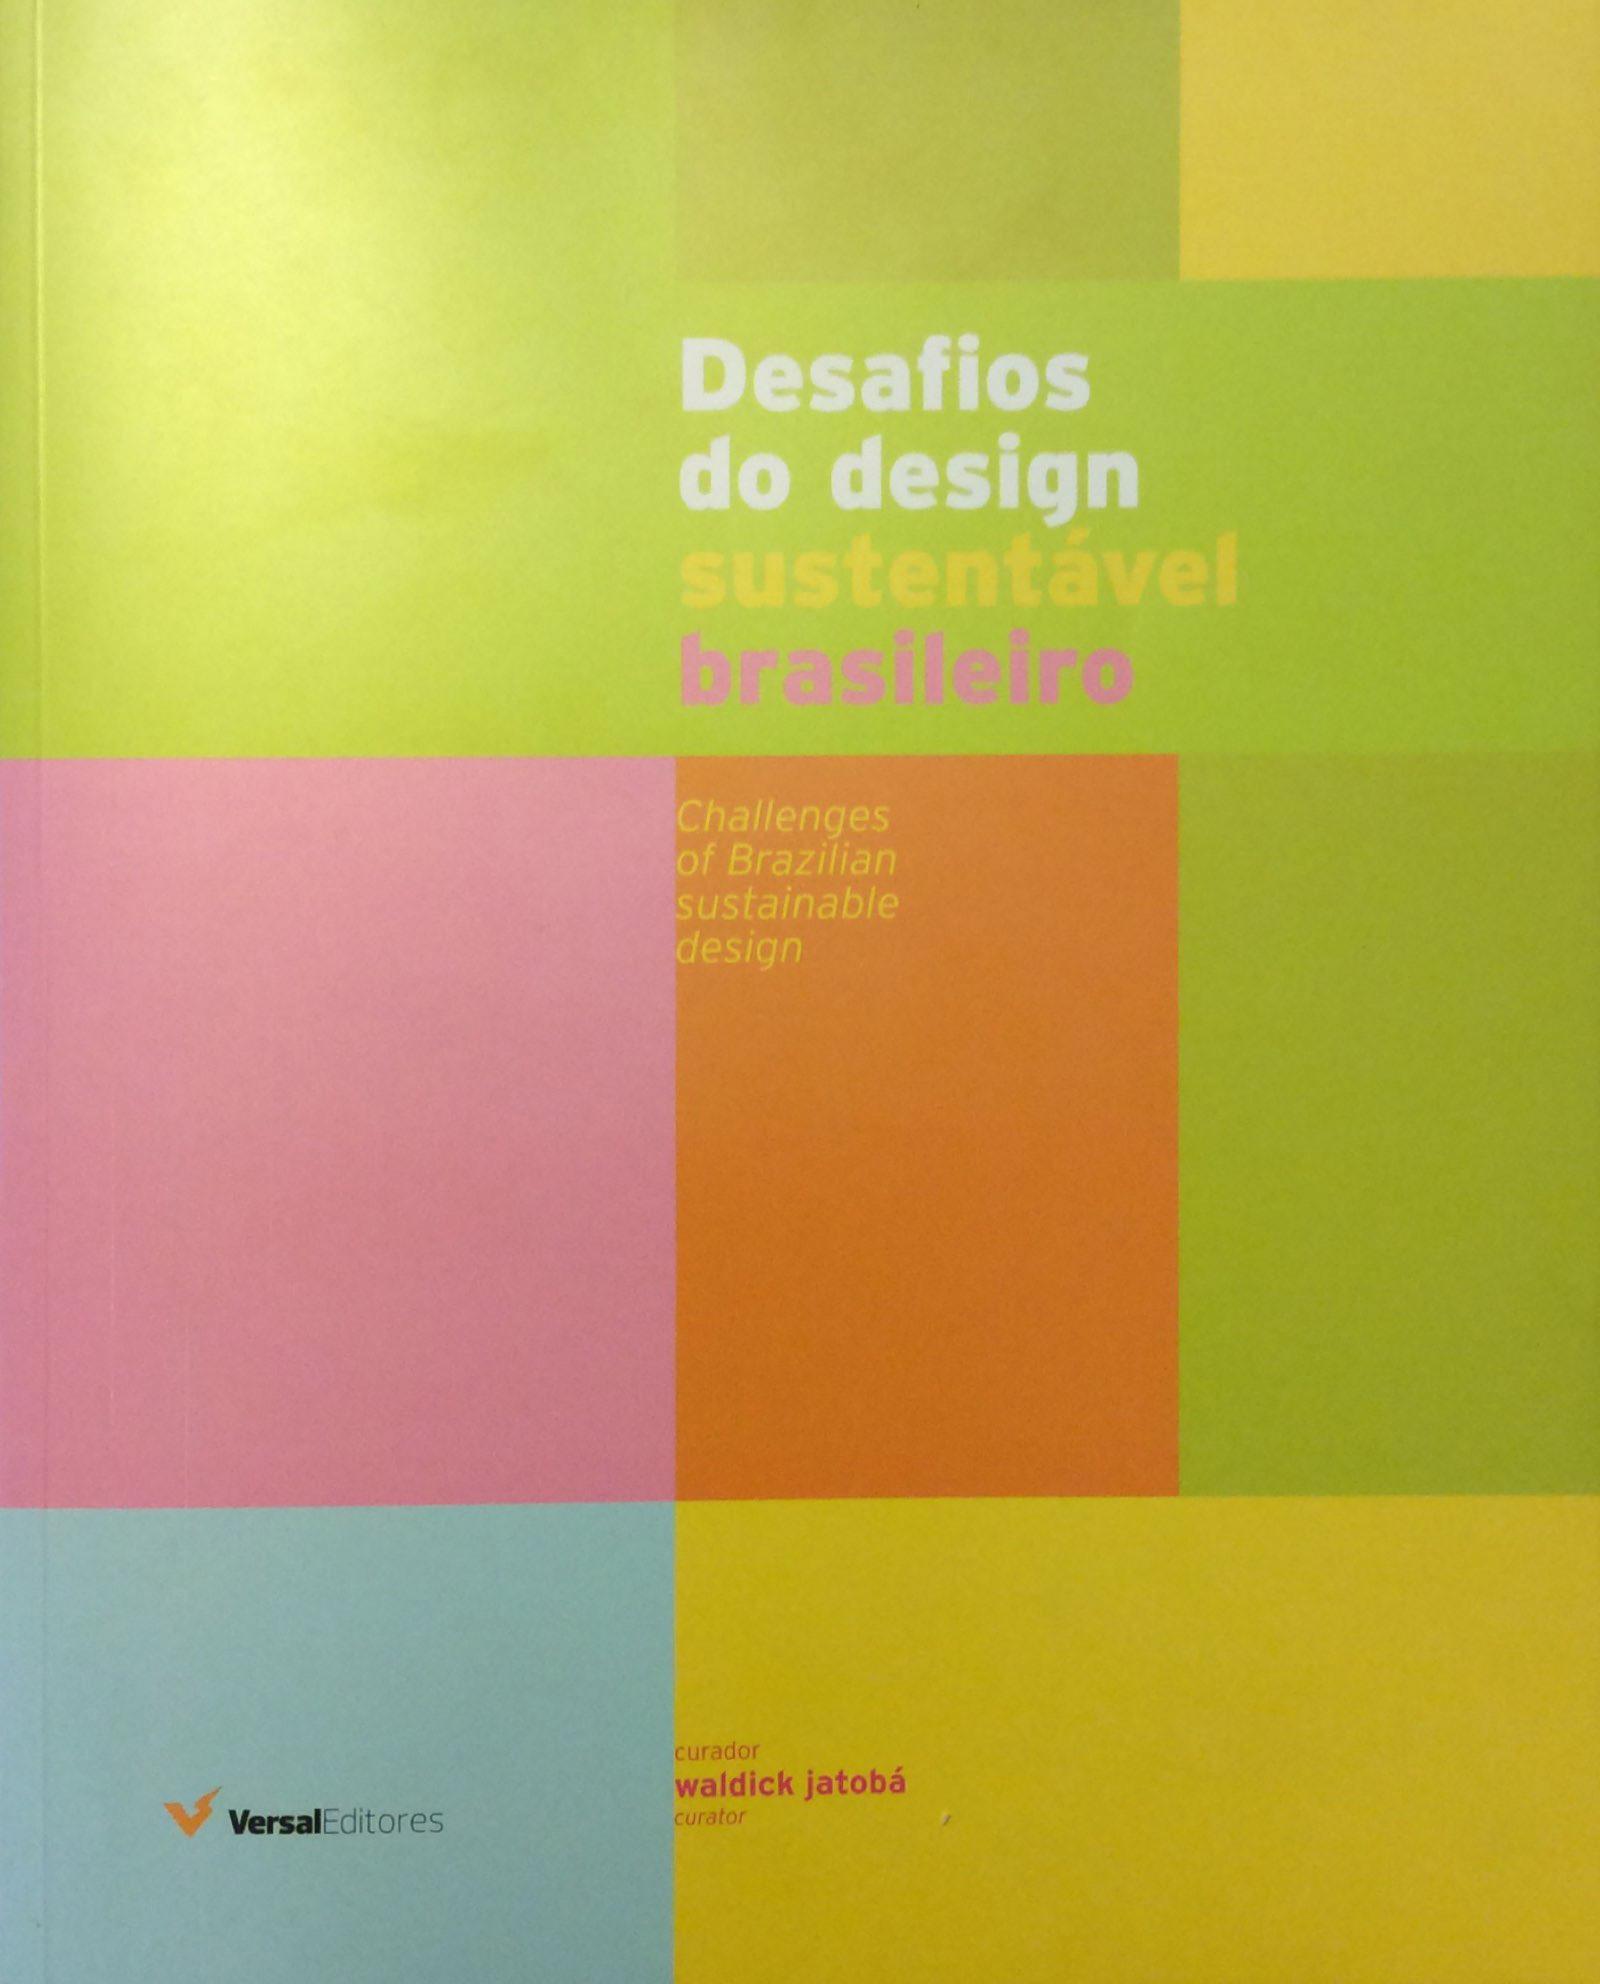 DSSB1.jpg